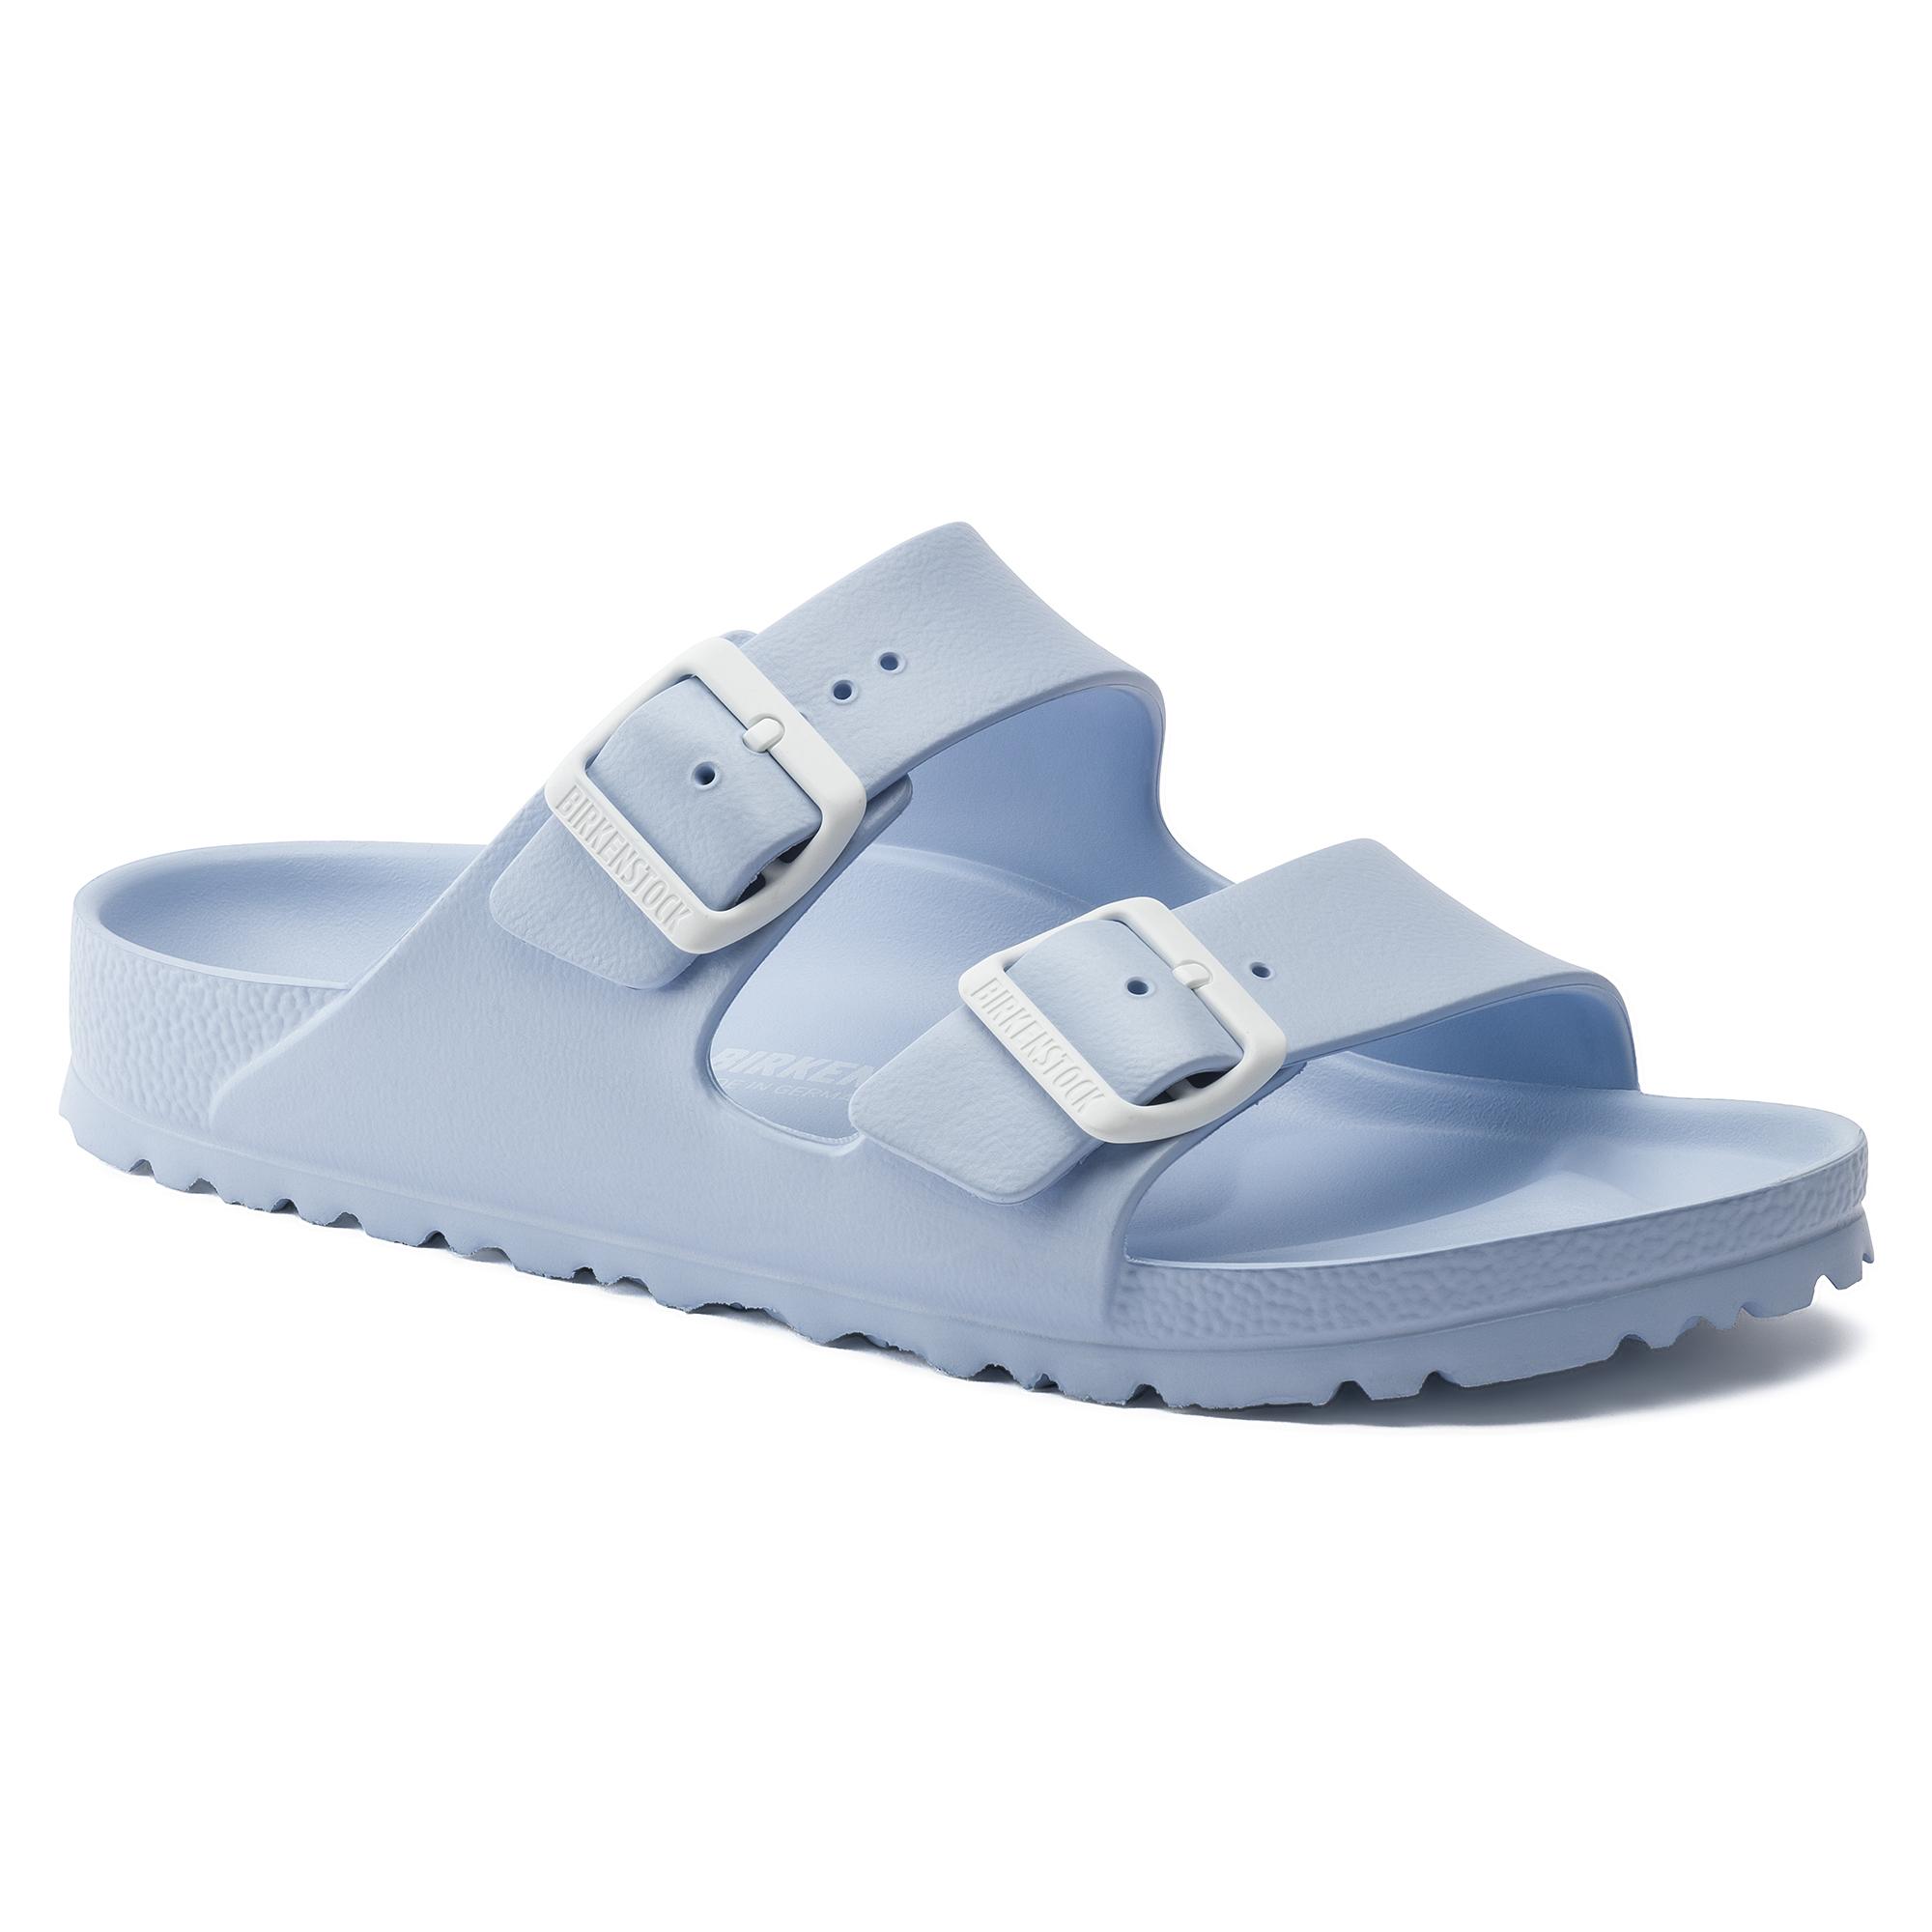 Arizona EVA Soft Blue | shop online at